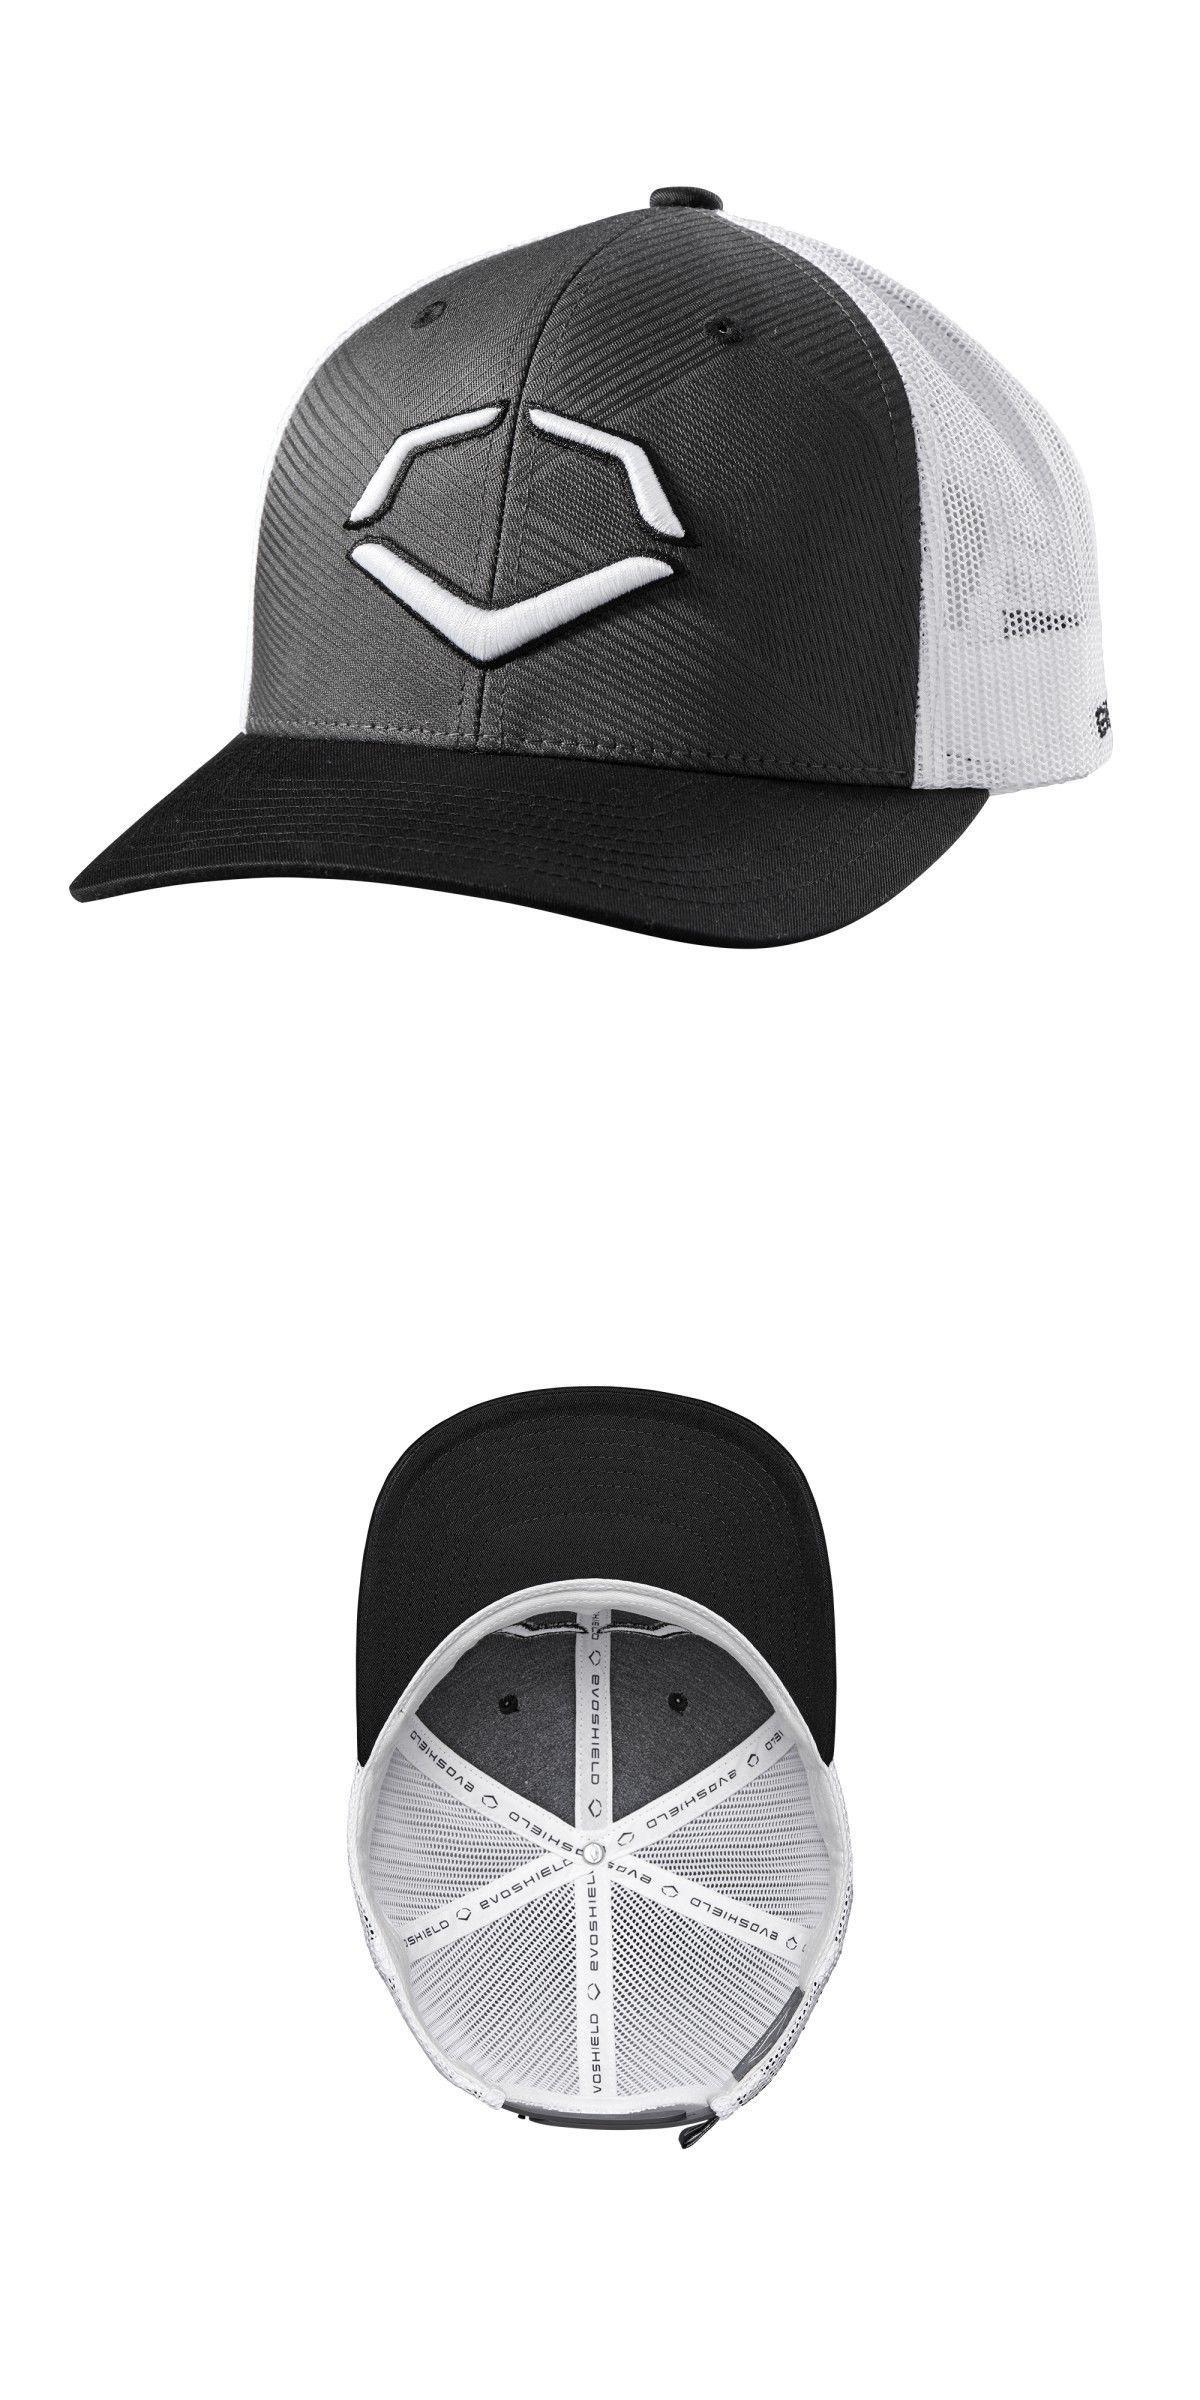 Hats and Headwear 159057  Evoshield Zig Zag Baseball Snapback Mesh Back Evoshield  Snapback Hat Cap 58f8b7bdc4ed